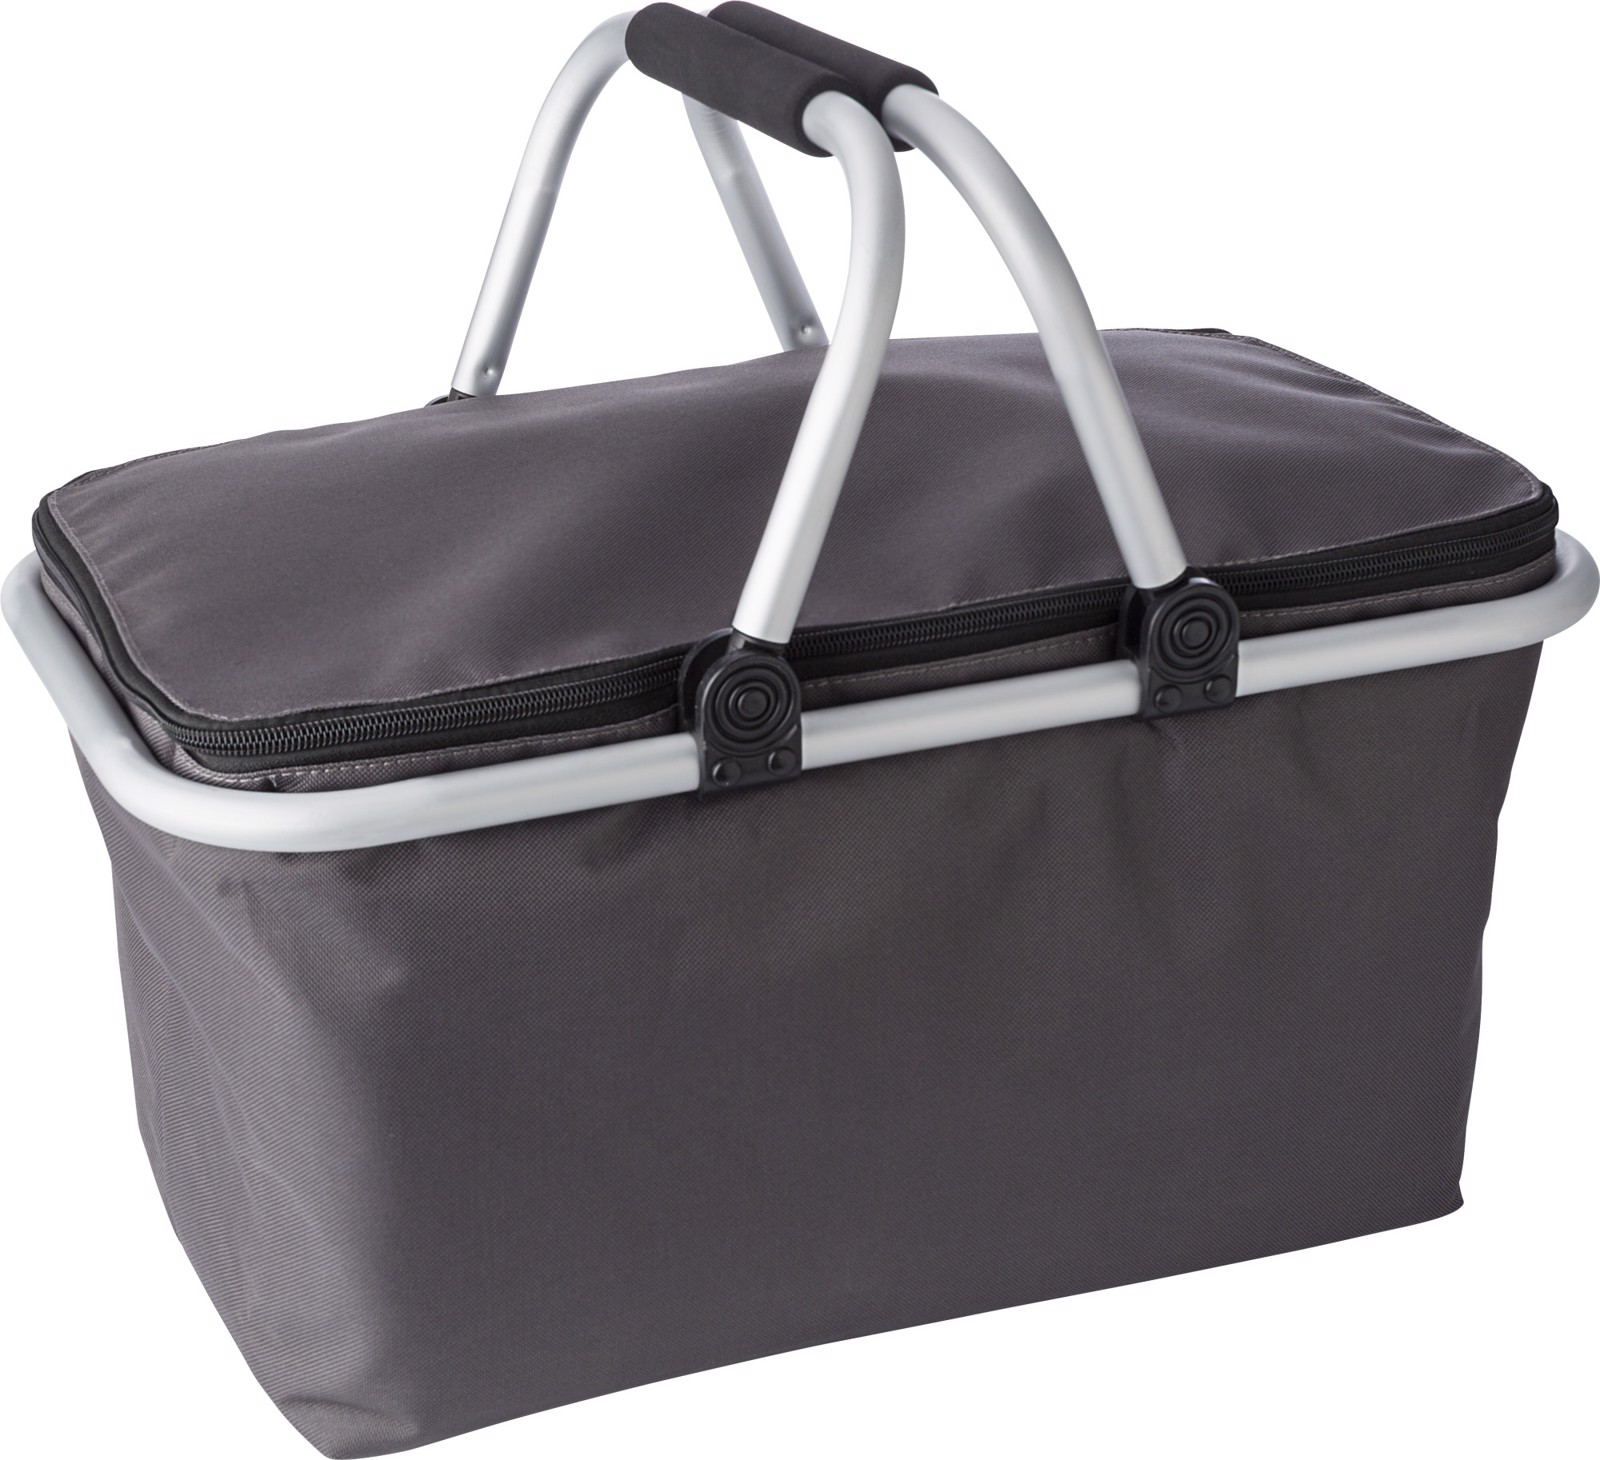 Polyester (320-330 gr/m²) shopping basket. - Grey